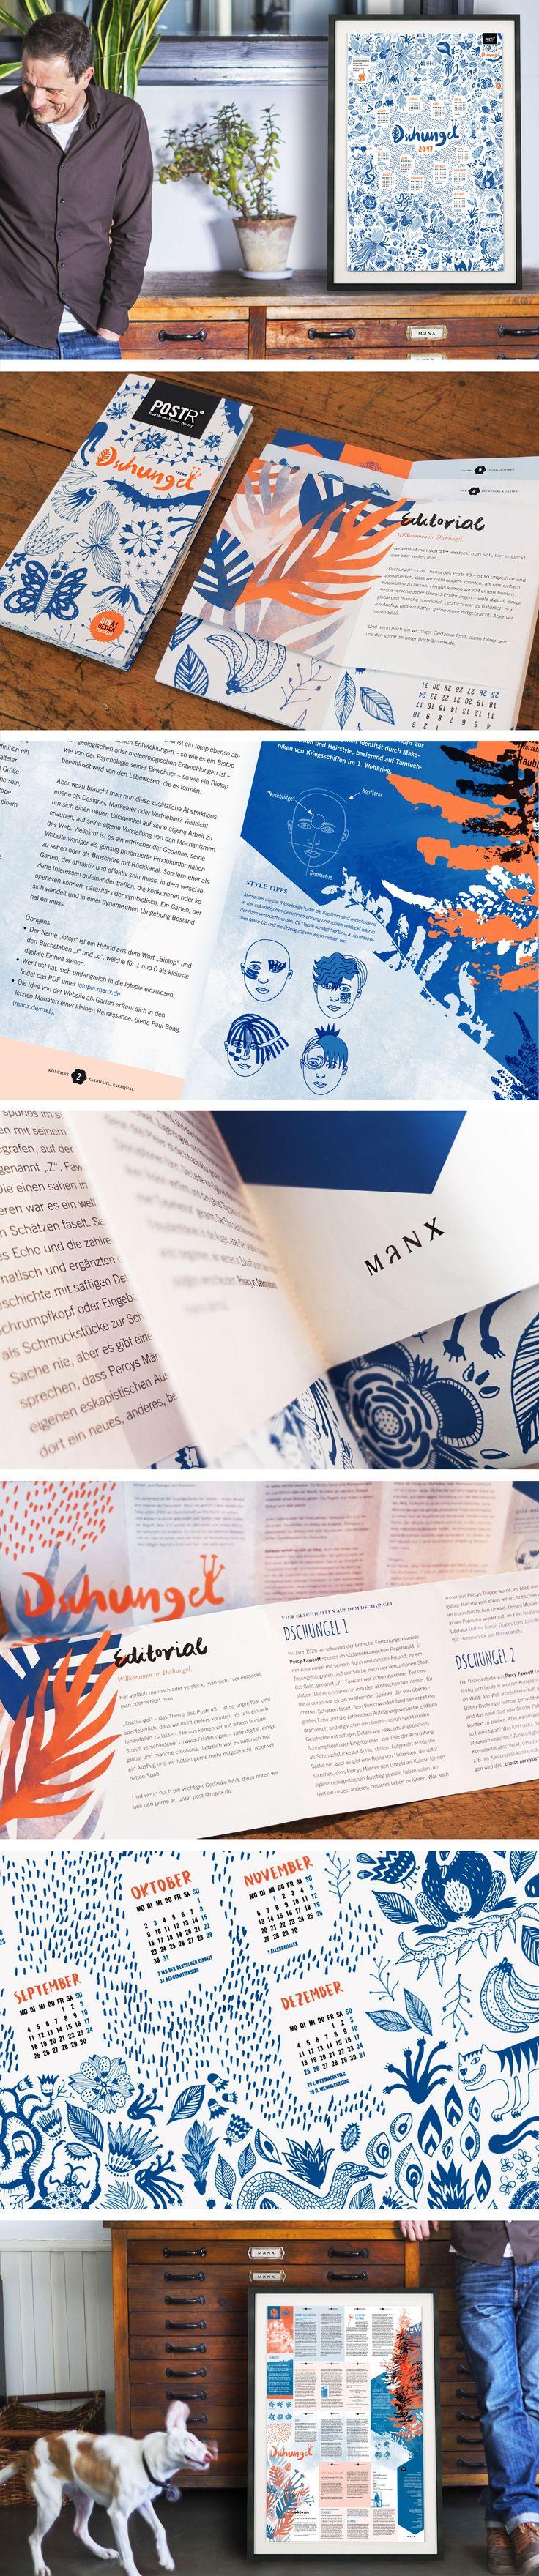 "Postr ""Dschungel"" | Magazin Postr von manxdesign |  manx, agency, Magazin, Plagazin, Poster, Postr, Editorial, Print, Typo, Logo, for free, Illustration, Kalender, 2017, manx, manxdesign, agency | www.manx.de"